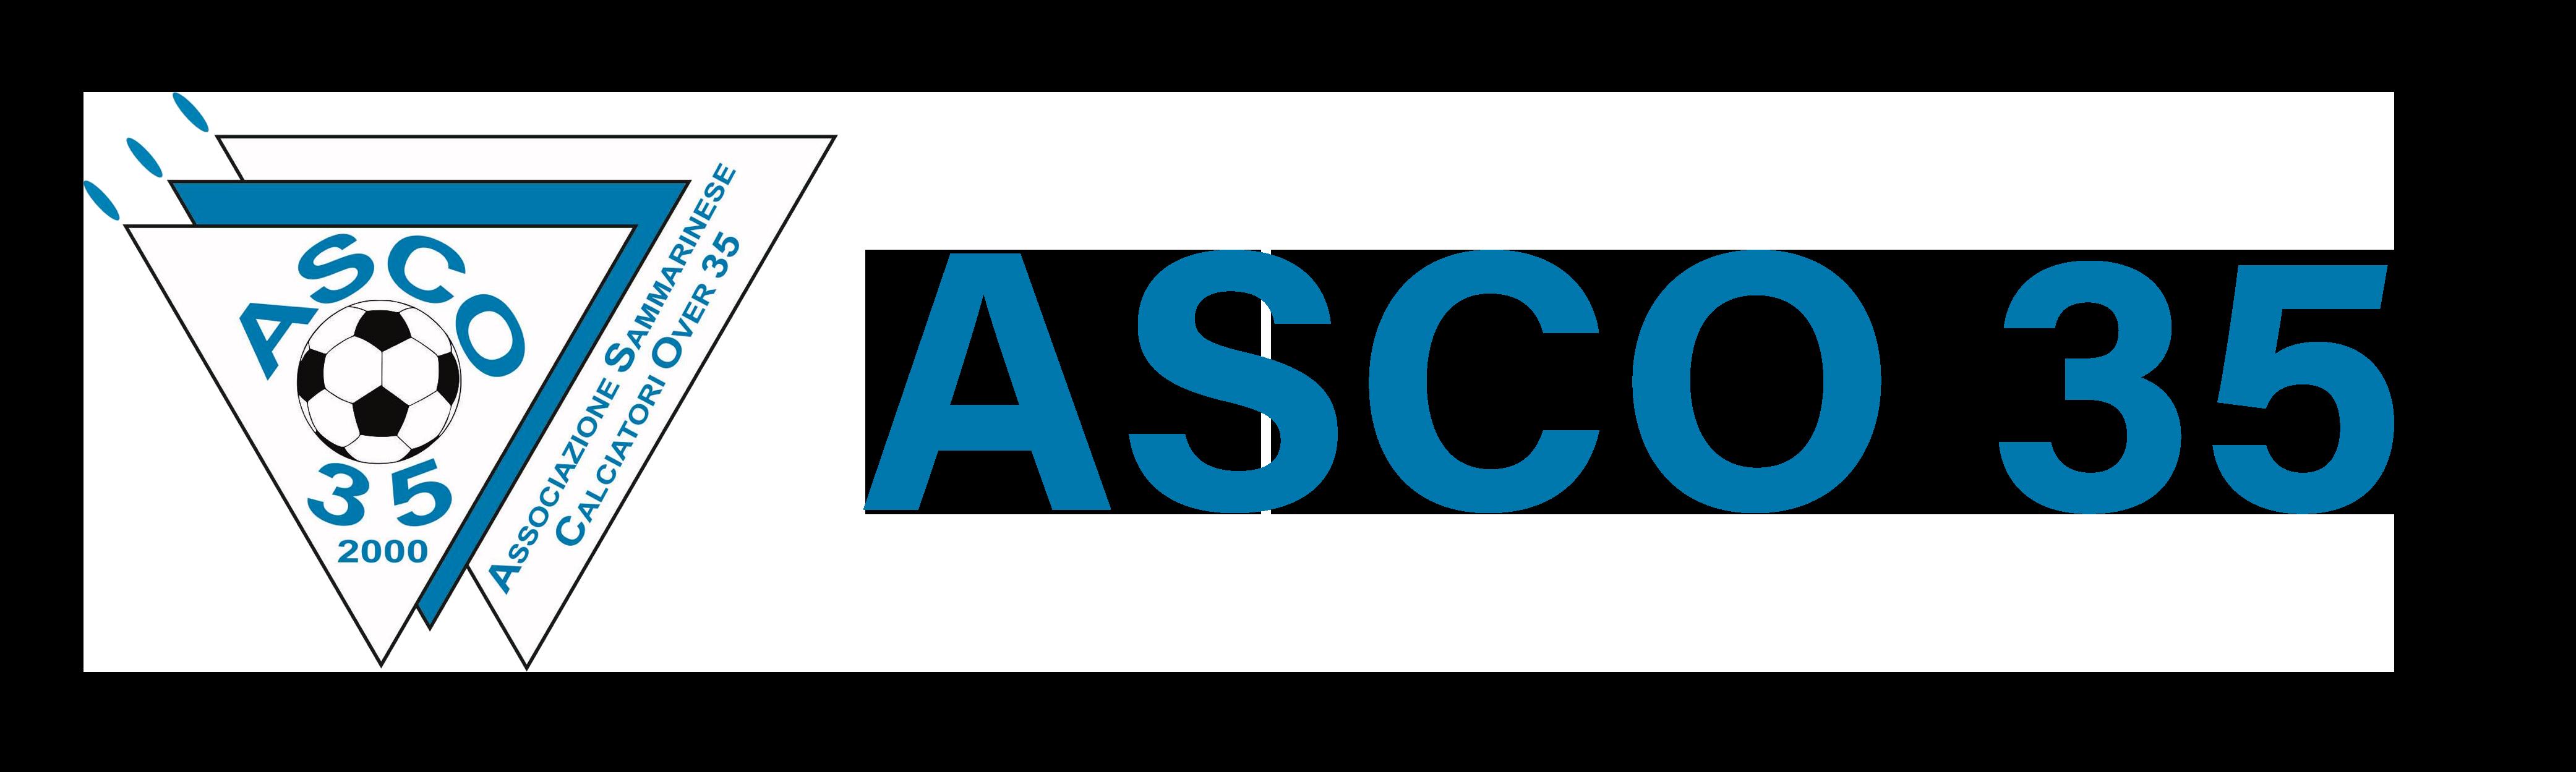 Asco 35